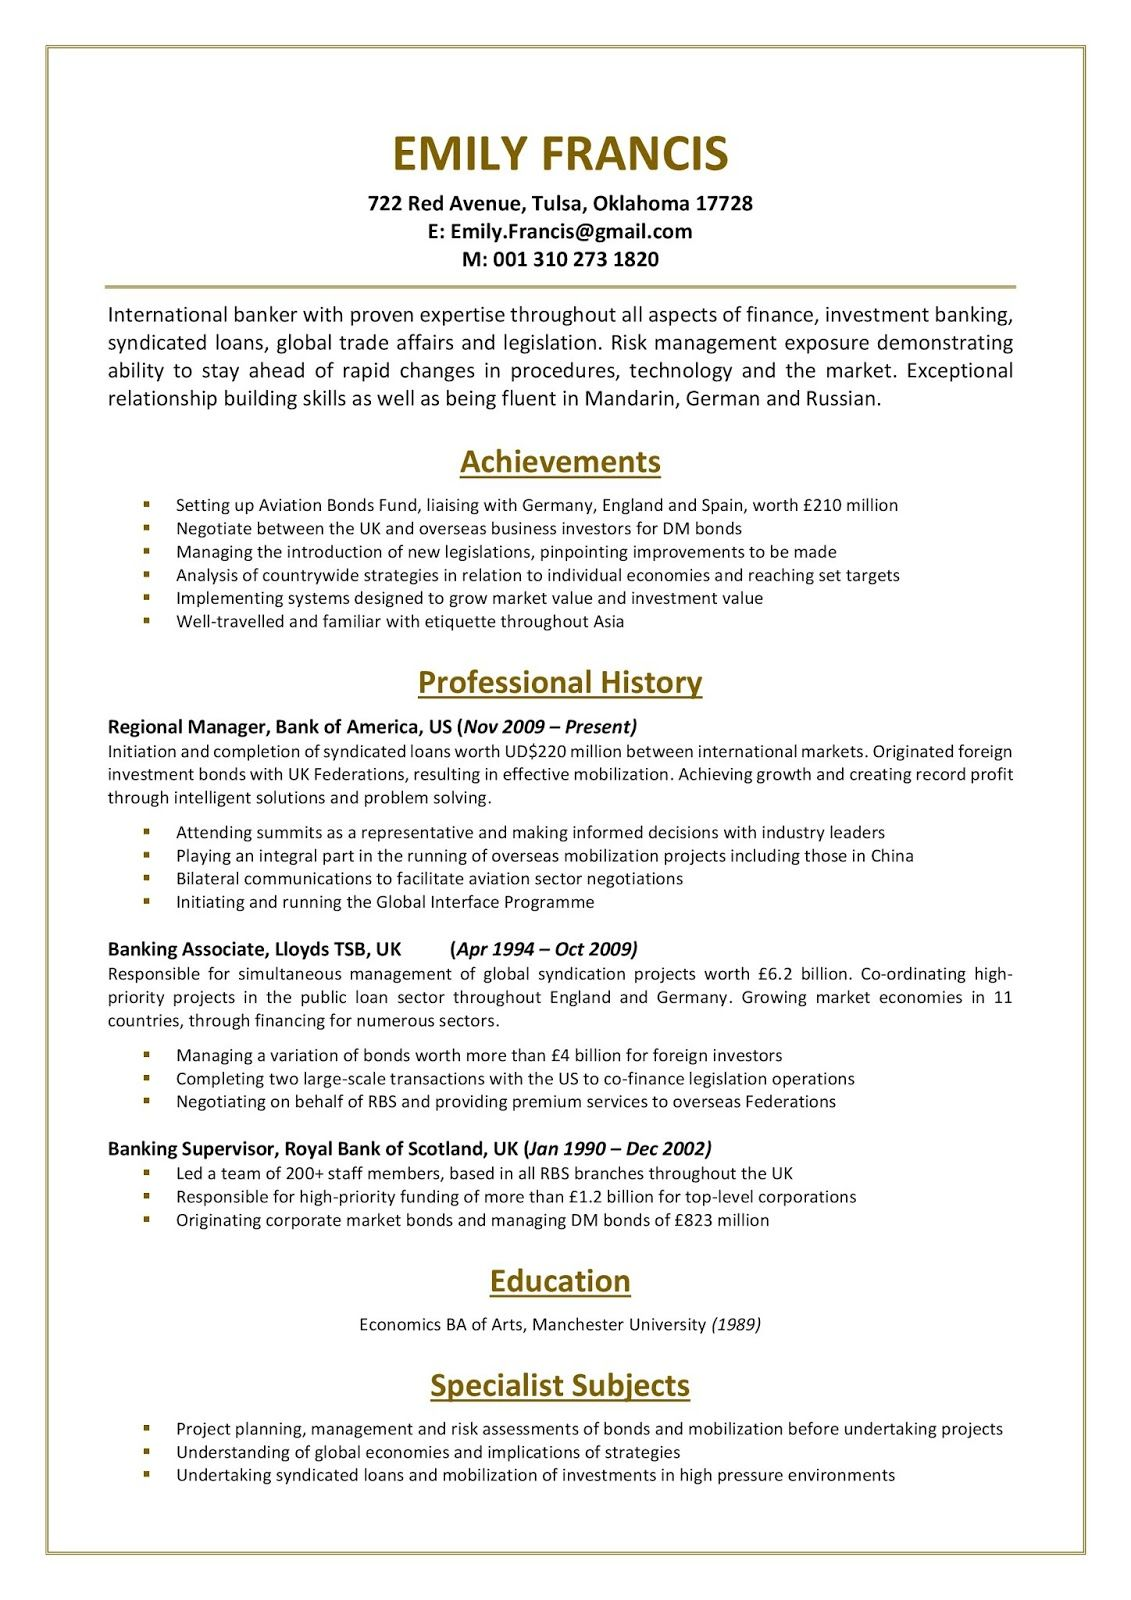 Bank Resume Template Download Bank Resume Template For Freshers World Bank Resume Templat Resume Template Free Professional Resume Template Job Resume Template